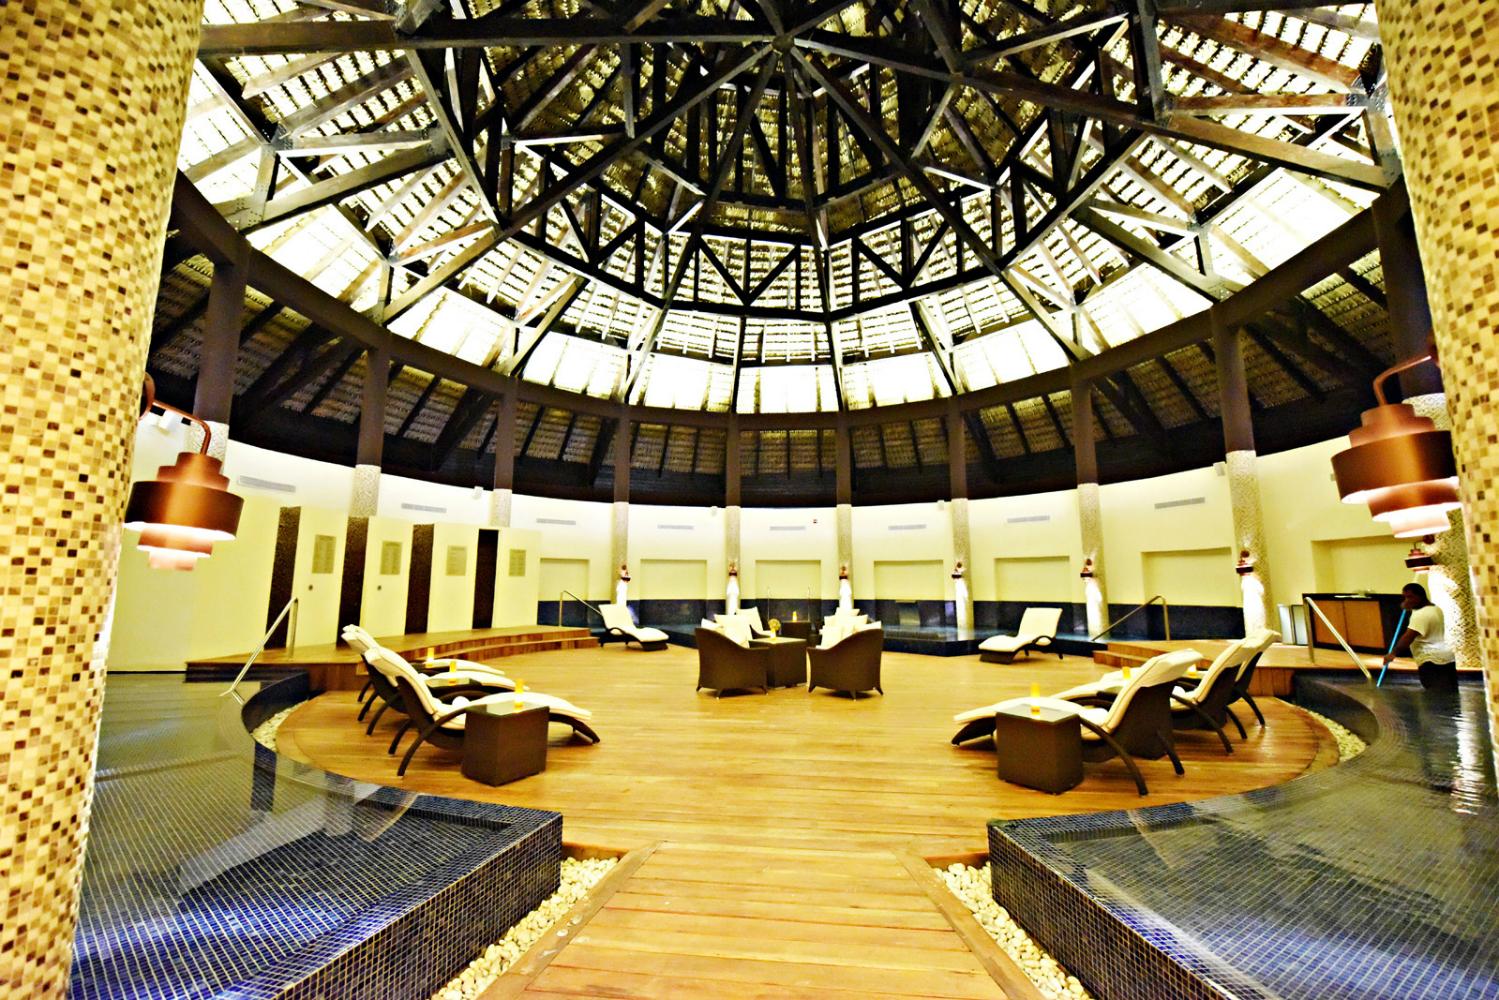 CHIC Punta Cana – The Royal Spa2-w1500-h1000